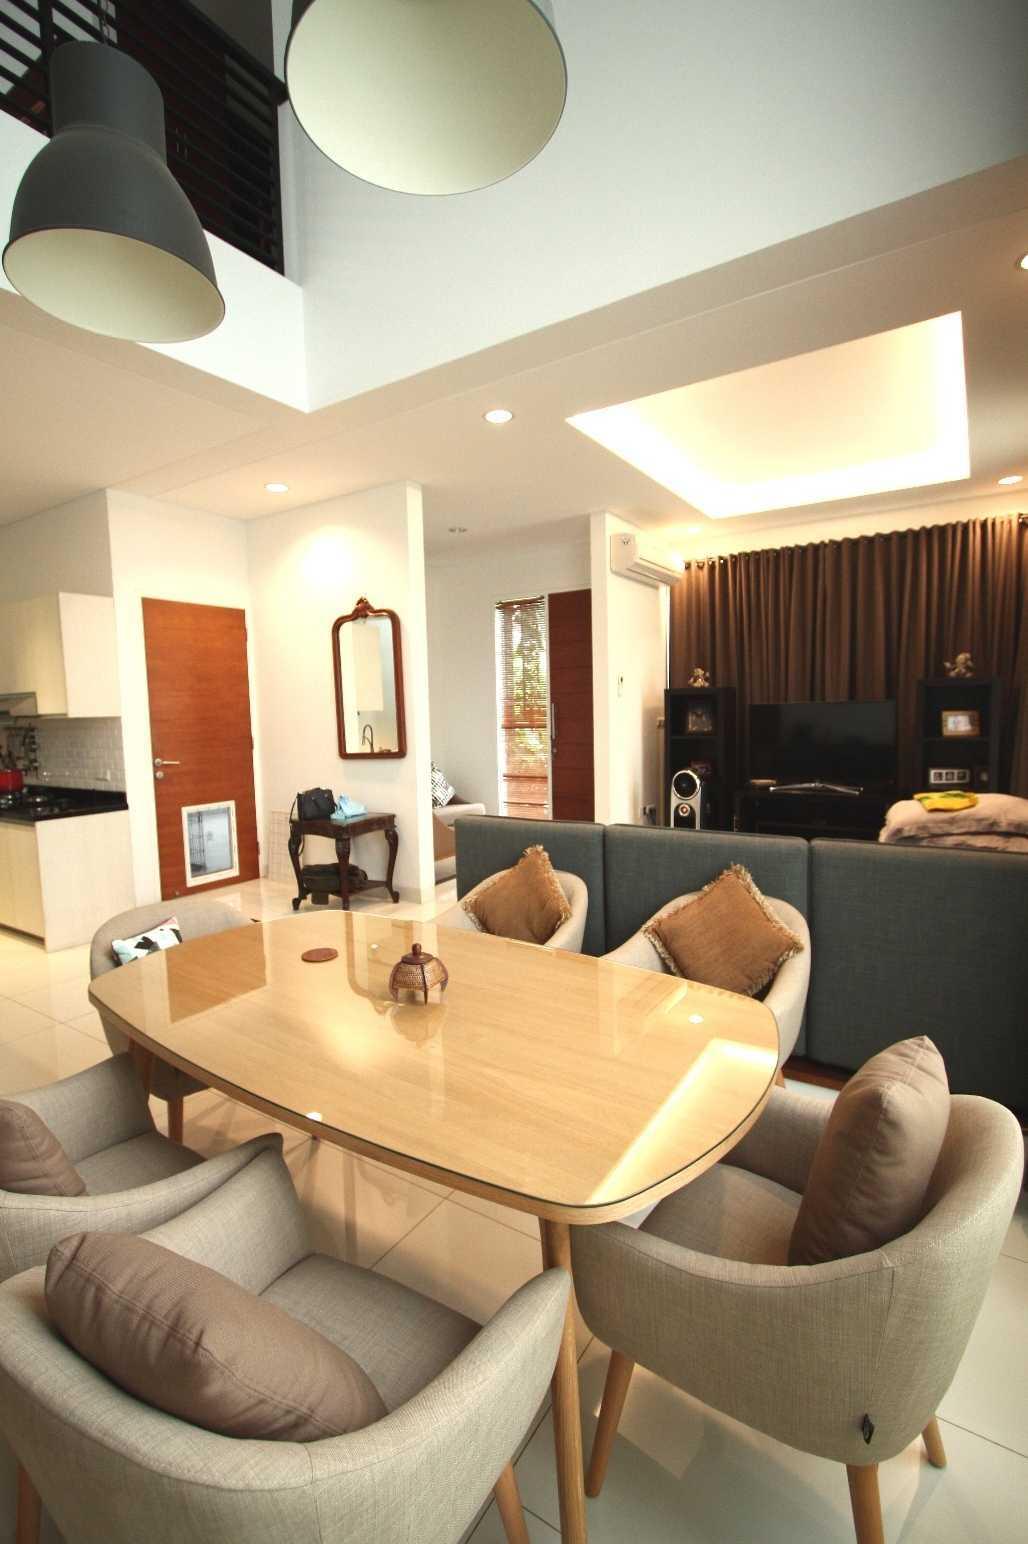 Ddap Architect Foresta Fiore House Bsd Tangerang Bsd Tangerang Img0883 Skandinavia  29562